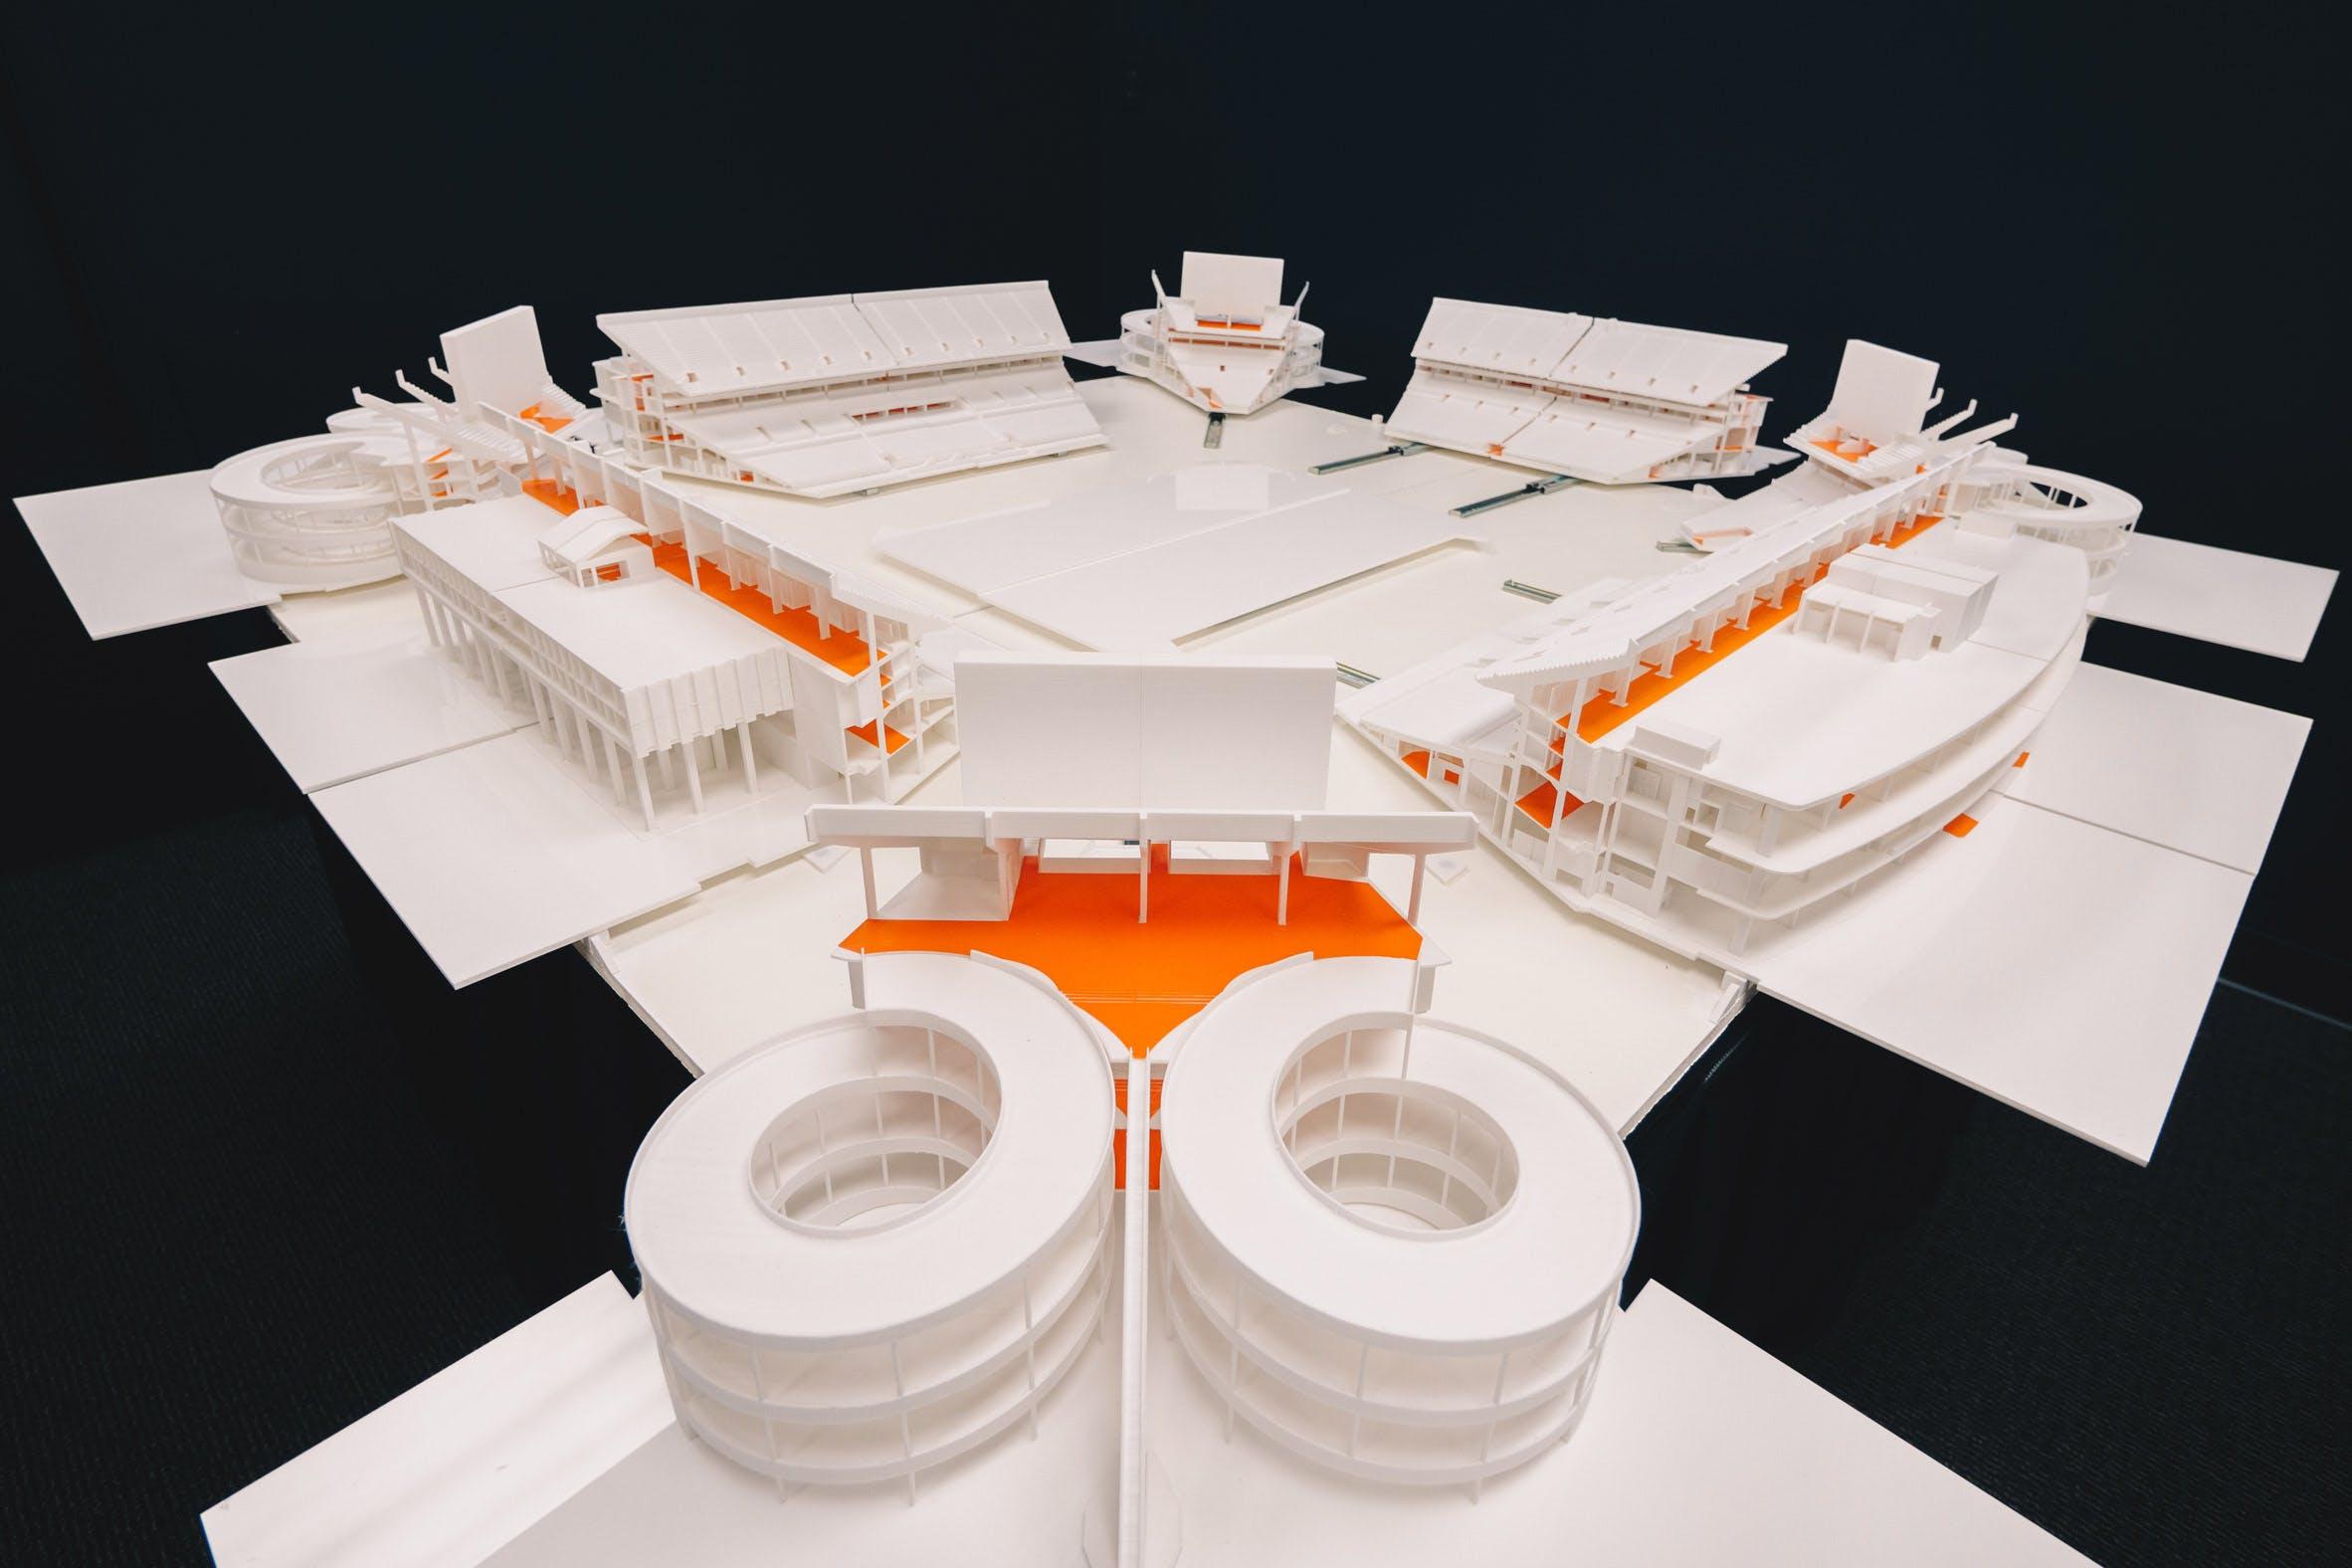 3D printed Hard Rock Stadium. Photo via Florida International University.